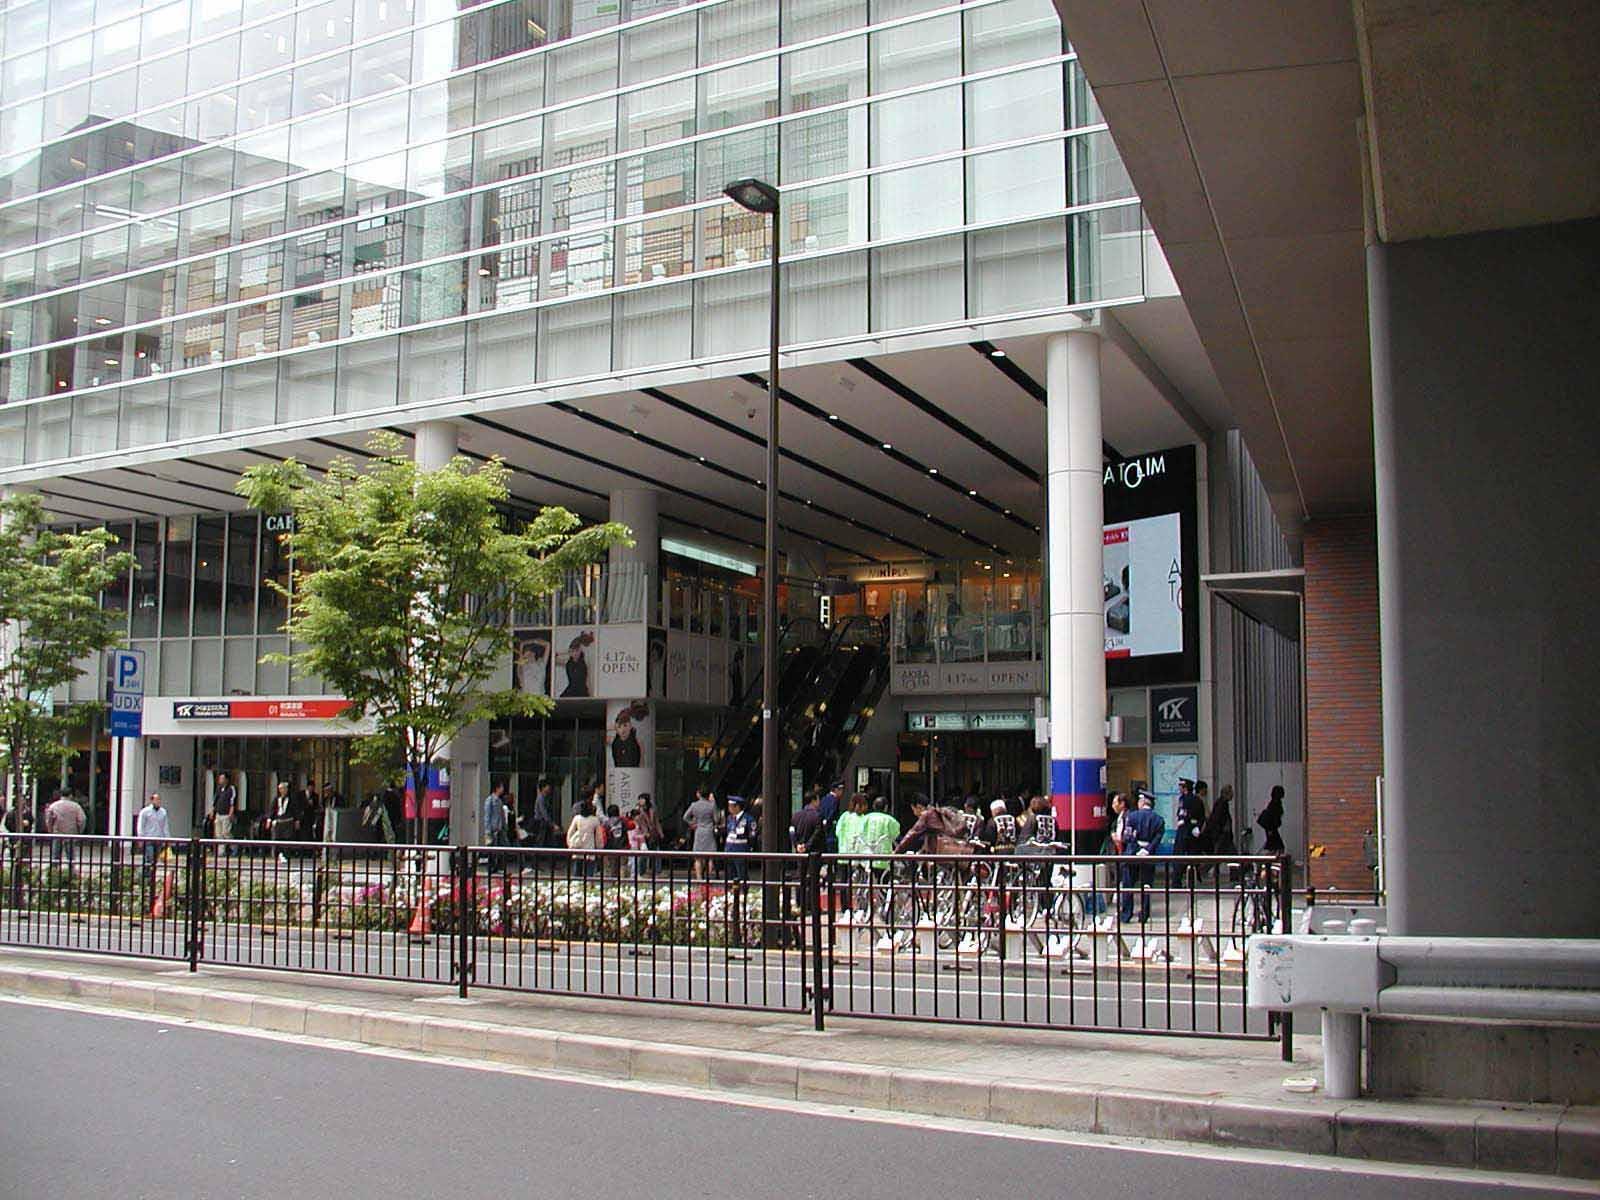 http://txoha101.c.blog.so-net.ne.jp/_images/blog/_d19/txoha101/aki-oka02-95a9e.jpg?c=a0